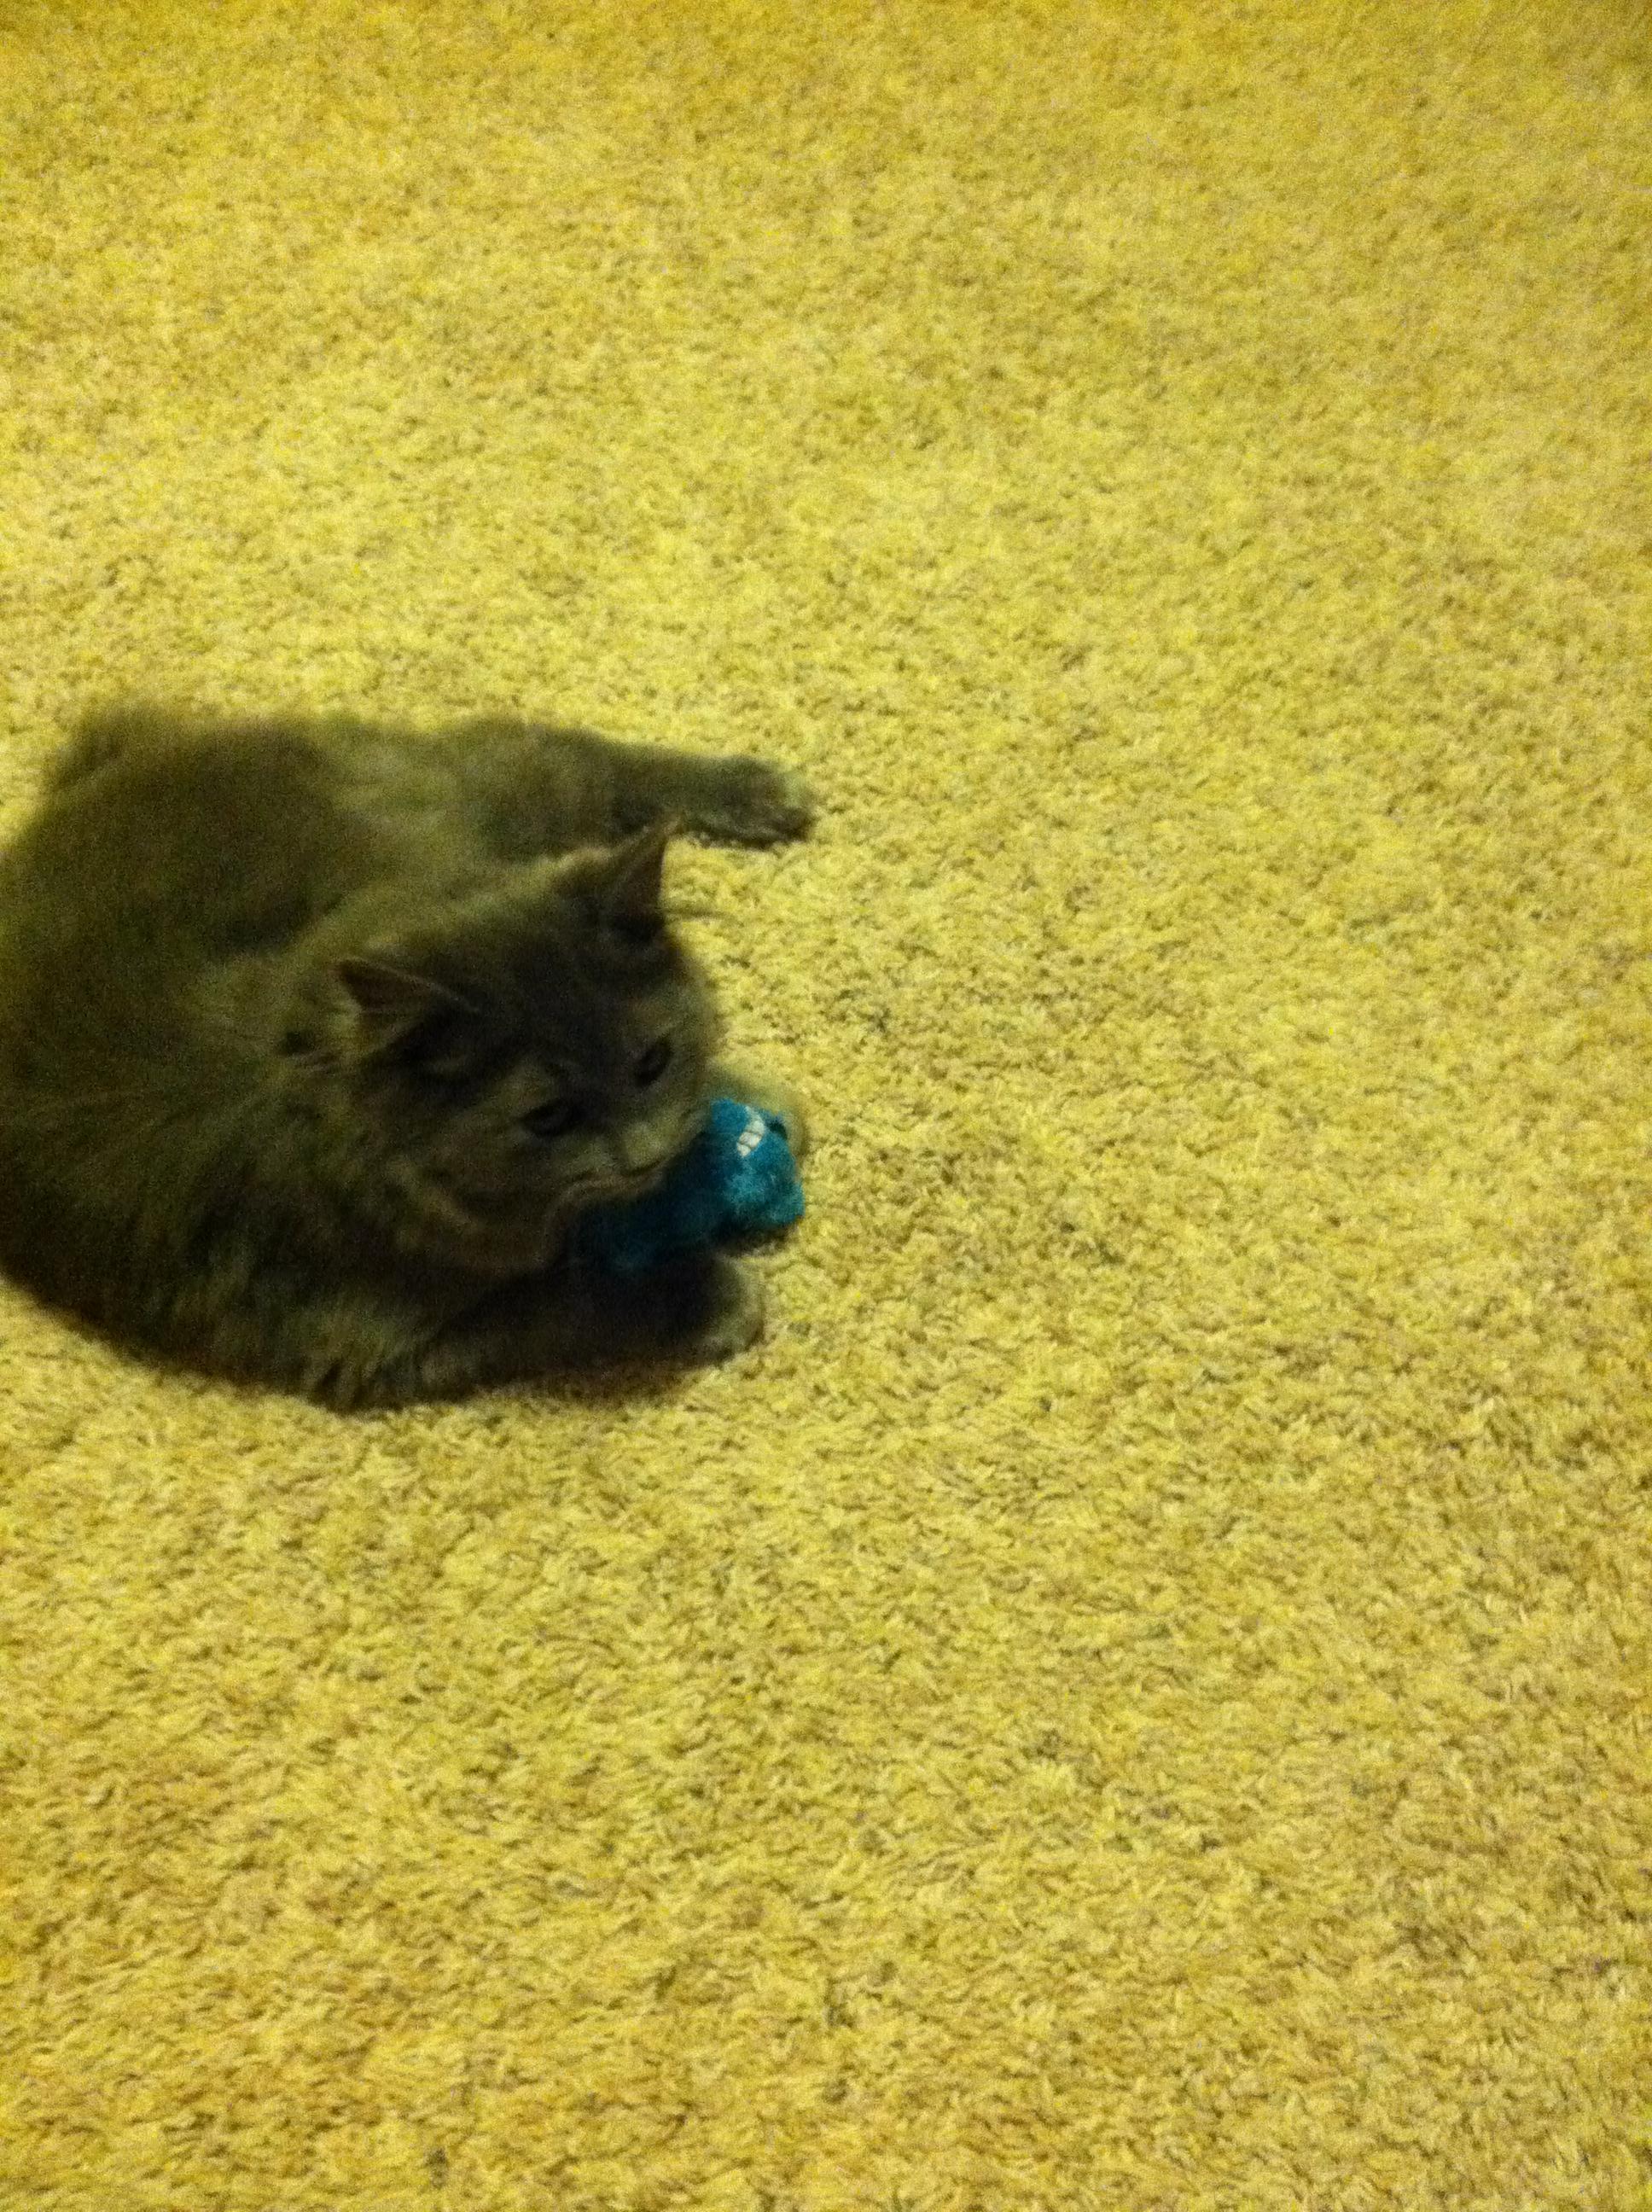 meeko with toy